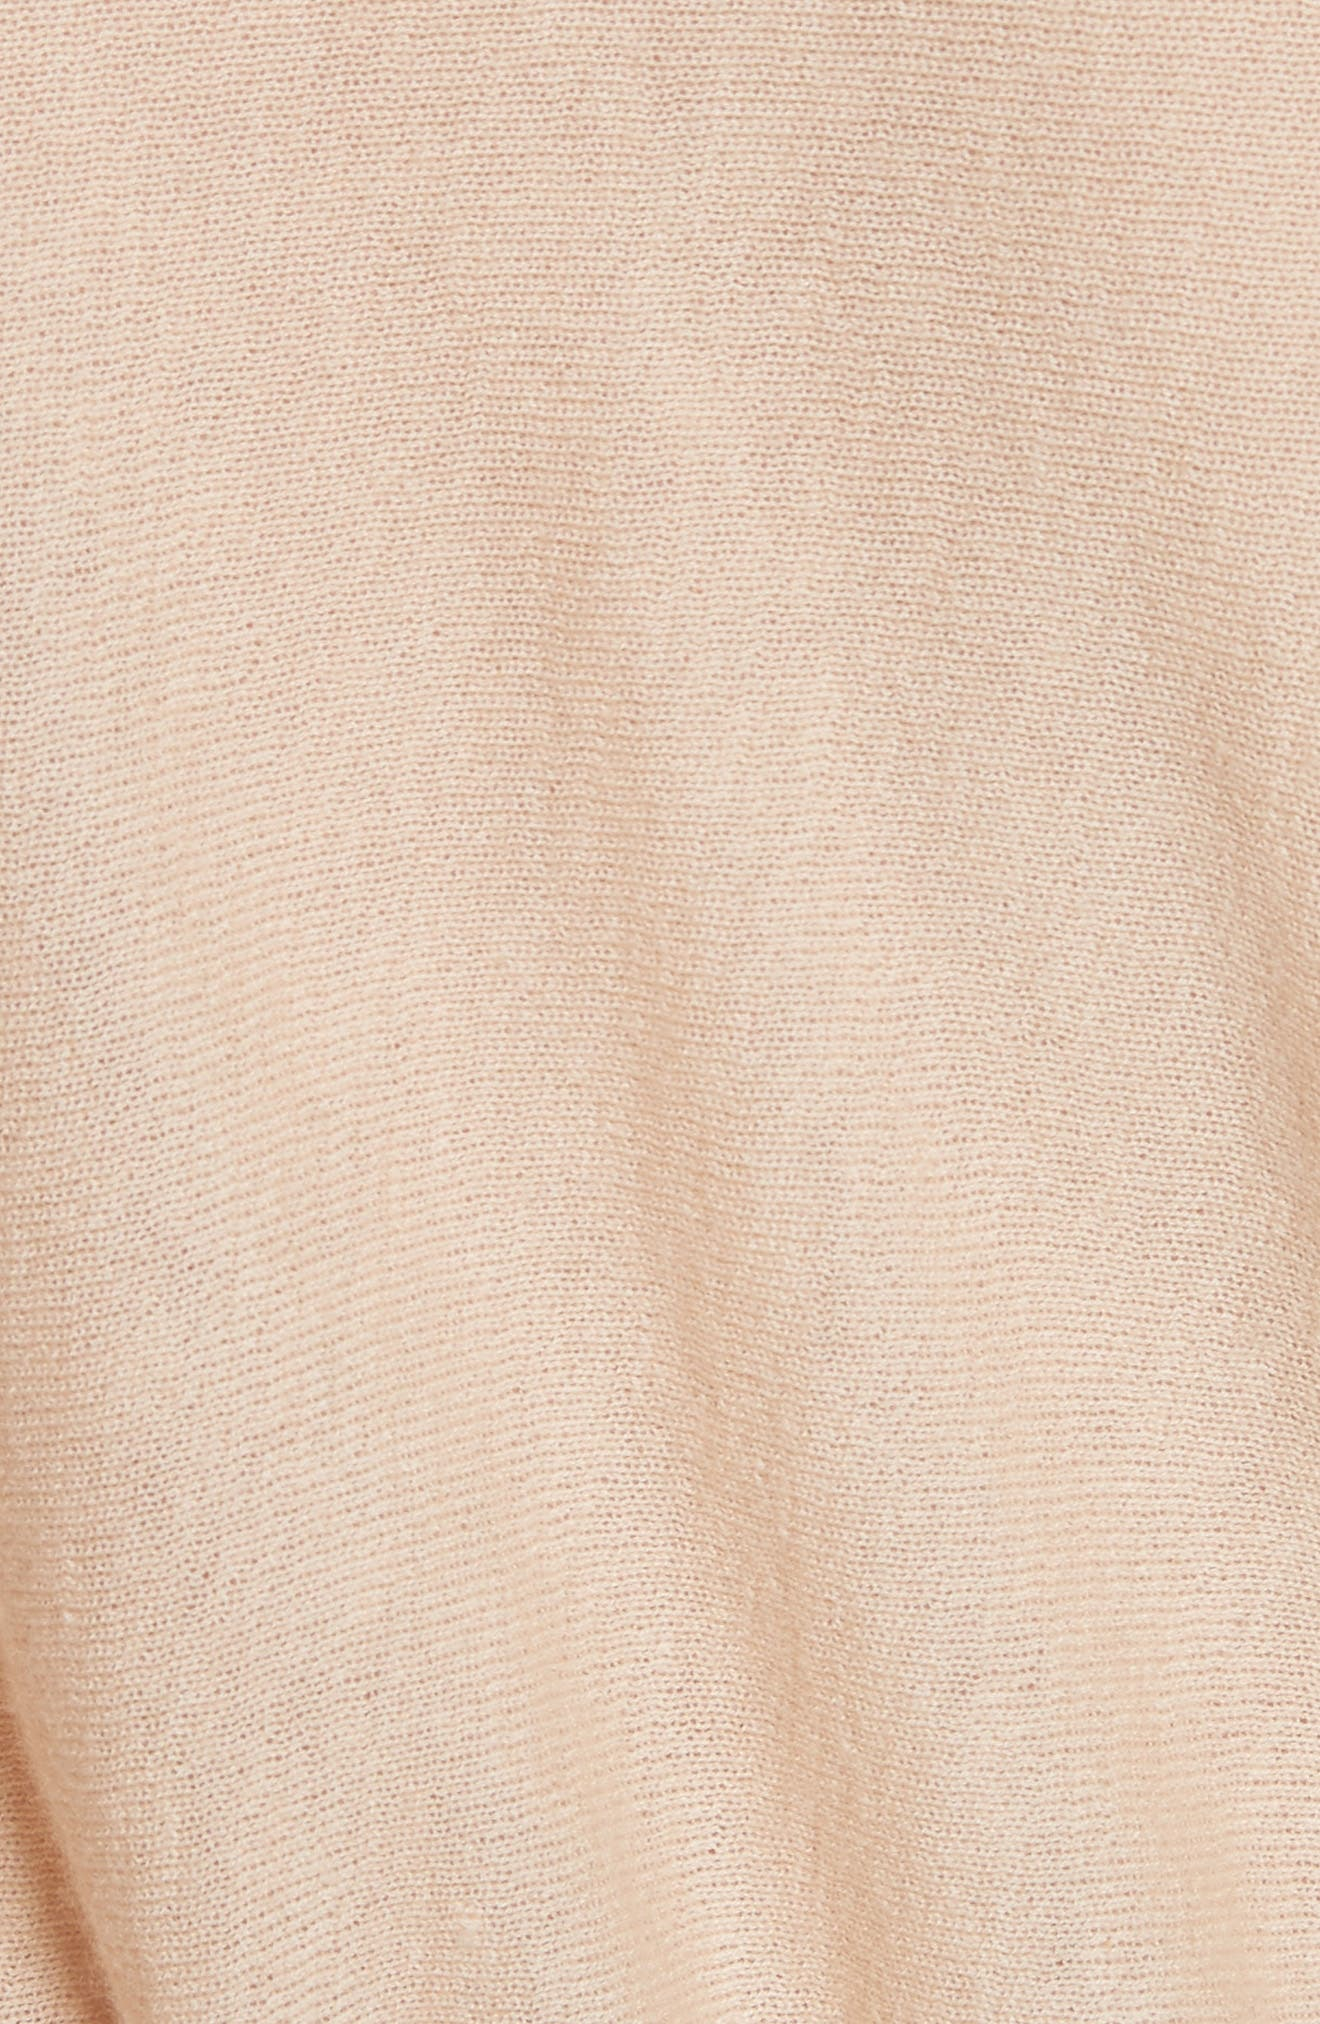 VINCE,                             Cinched Back Cashmere Sweater,                             Alternate thumbnail 5, color,                             298